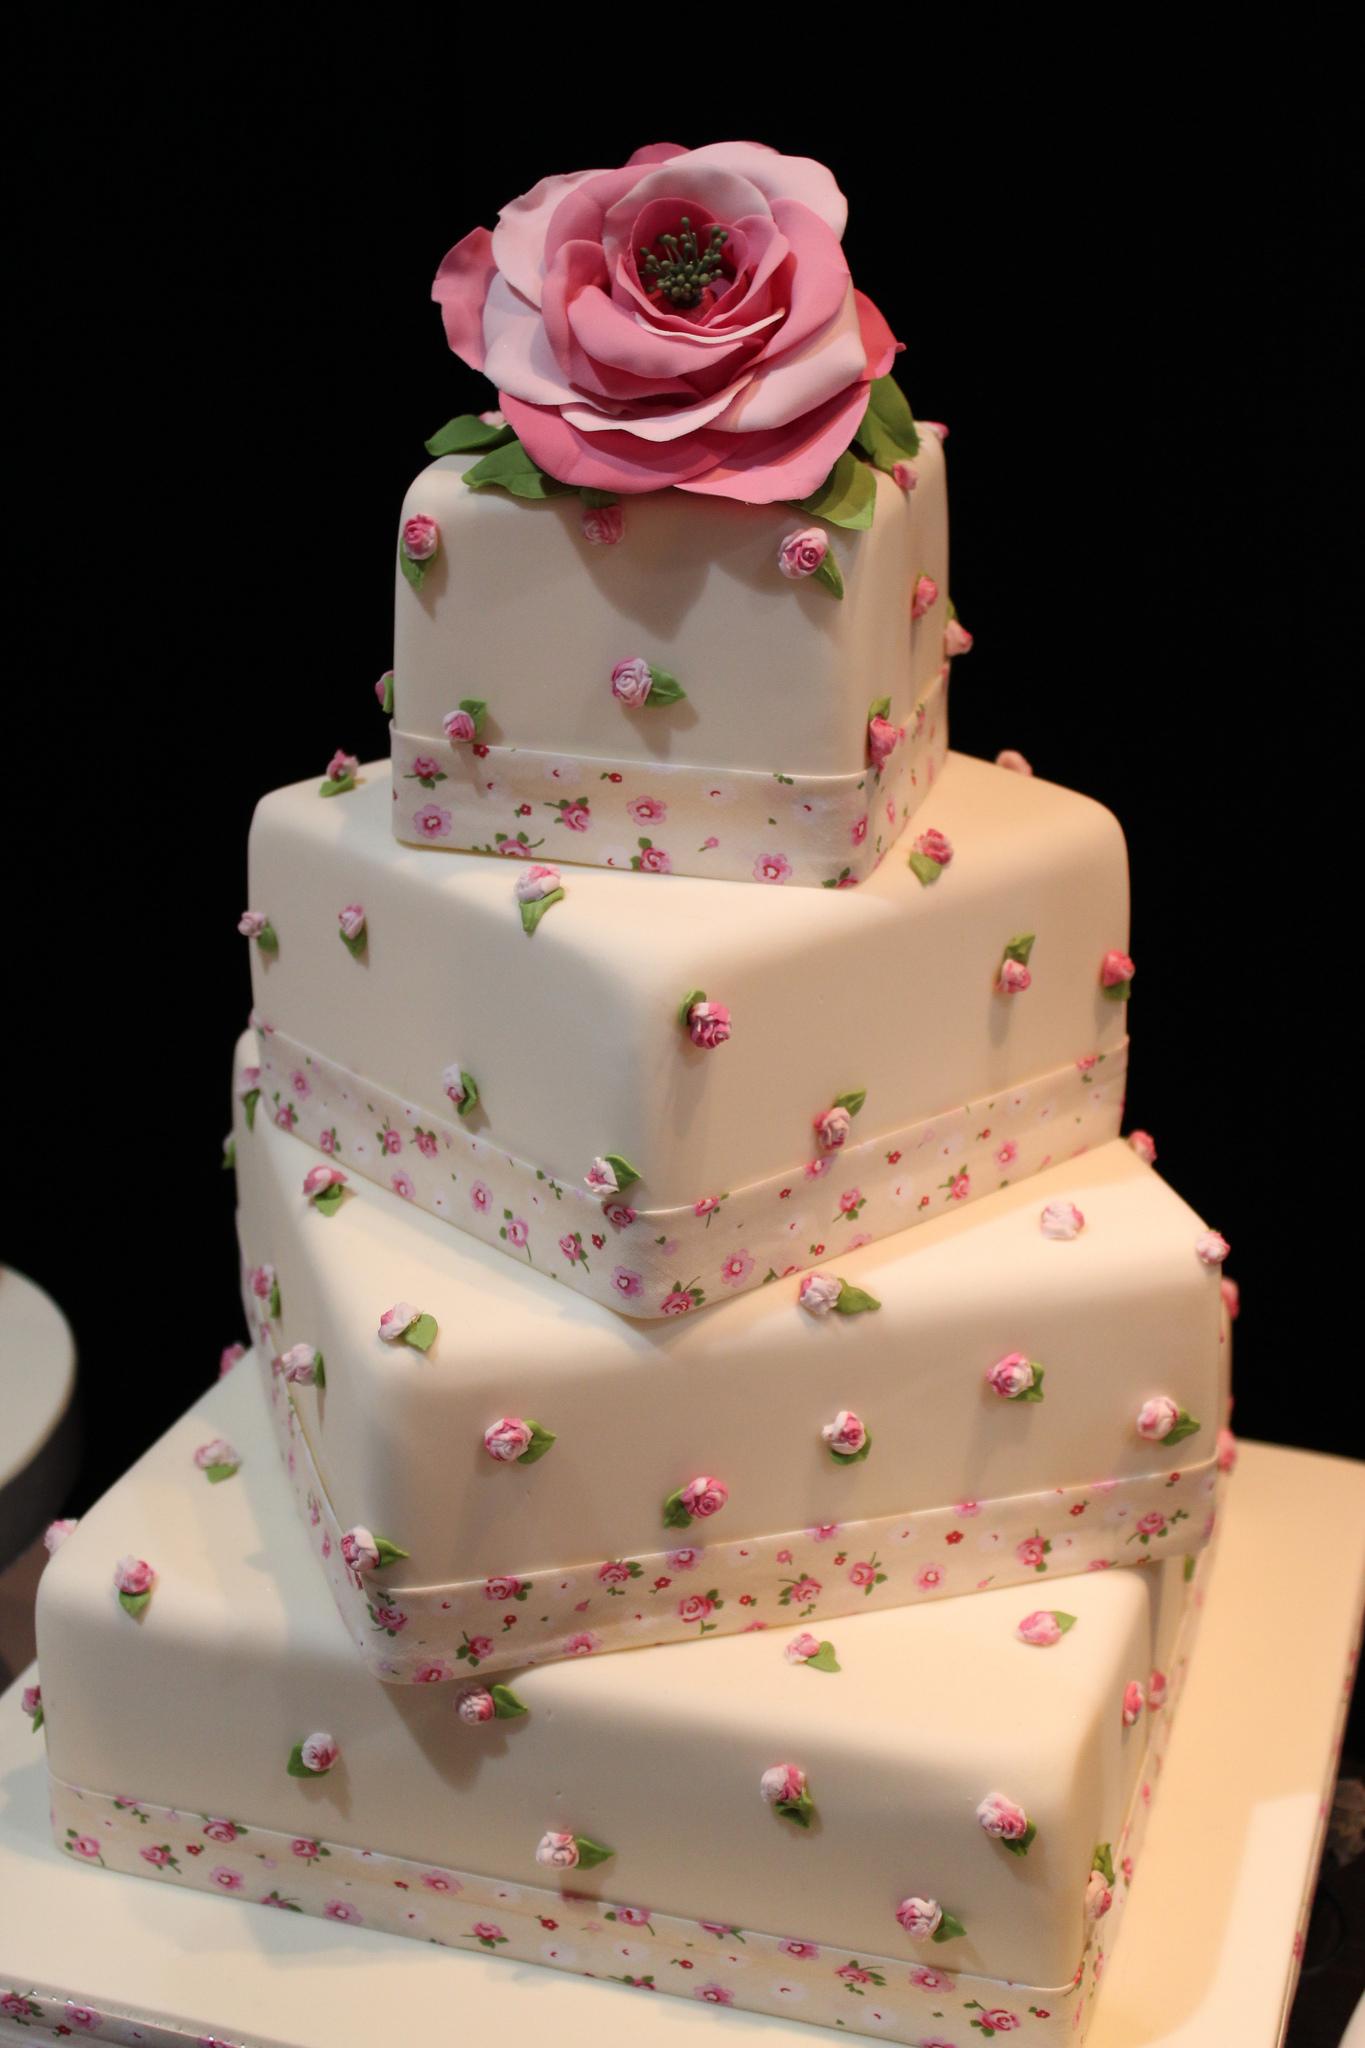 Rose Birthday Cake Ideas